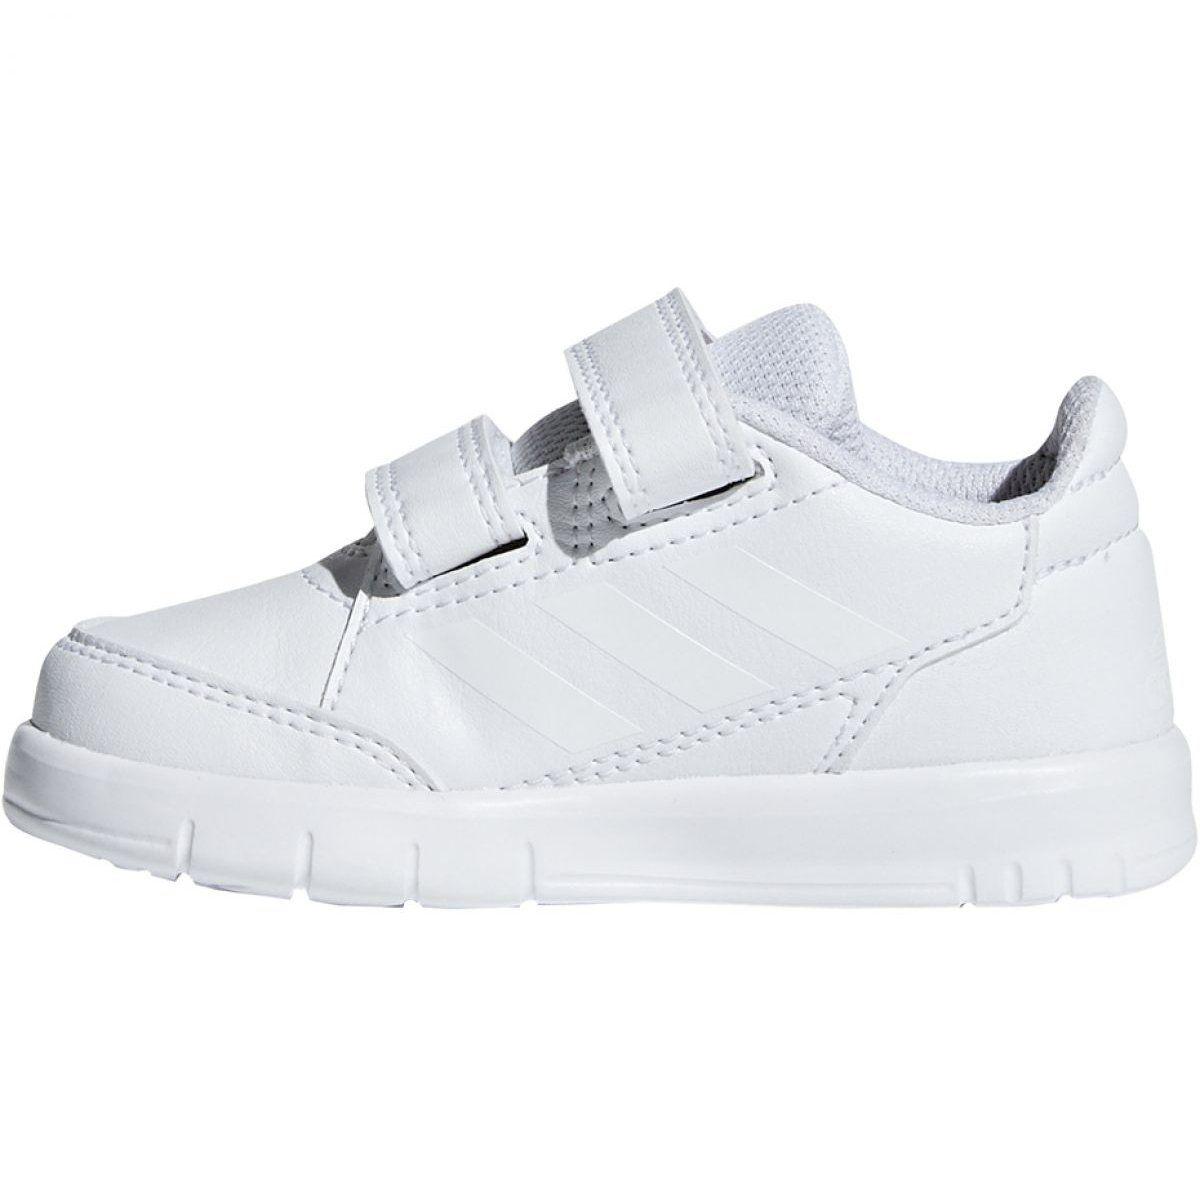 Buty Adidas Altasport Cf I D96848 Biale Shoes Kid Shoes Childrens Shoes